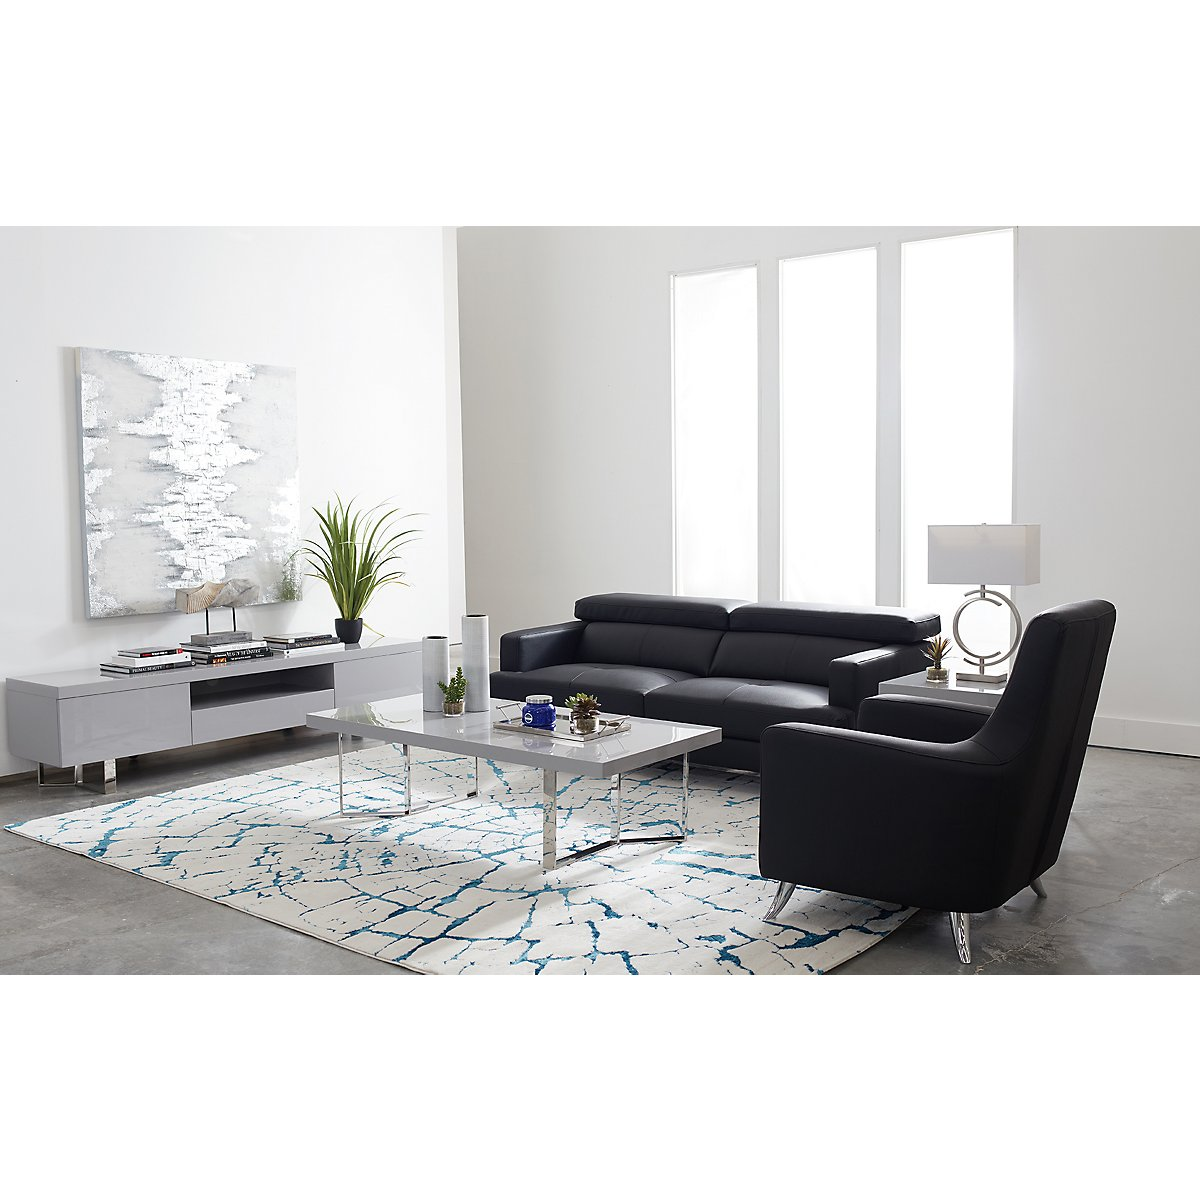 City Furniture: Marquez Black Microfiber Accent Chair